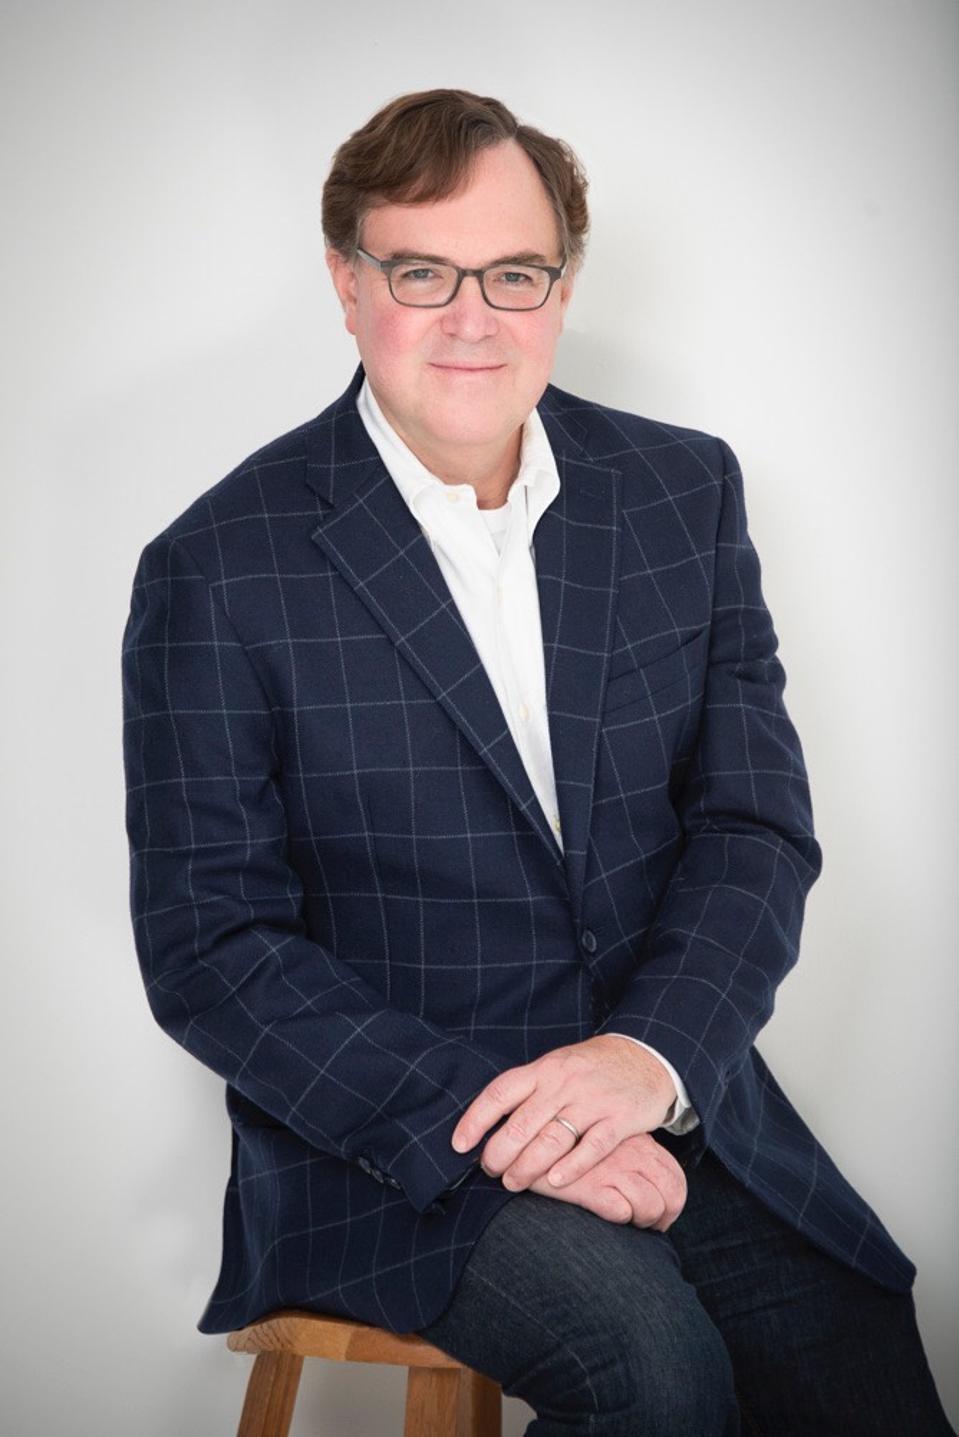 Terrance O'Malley, TJO Management